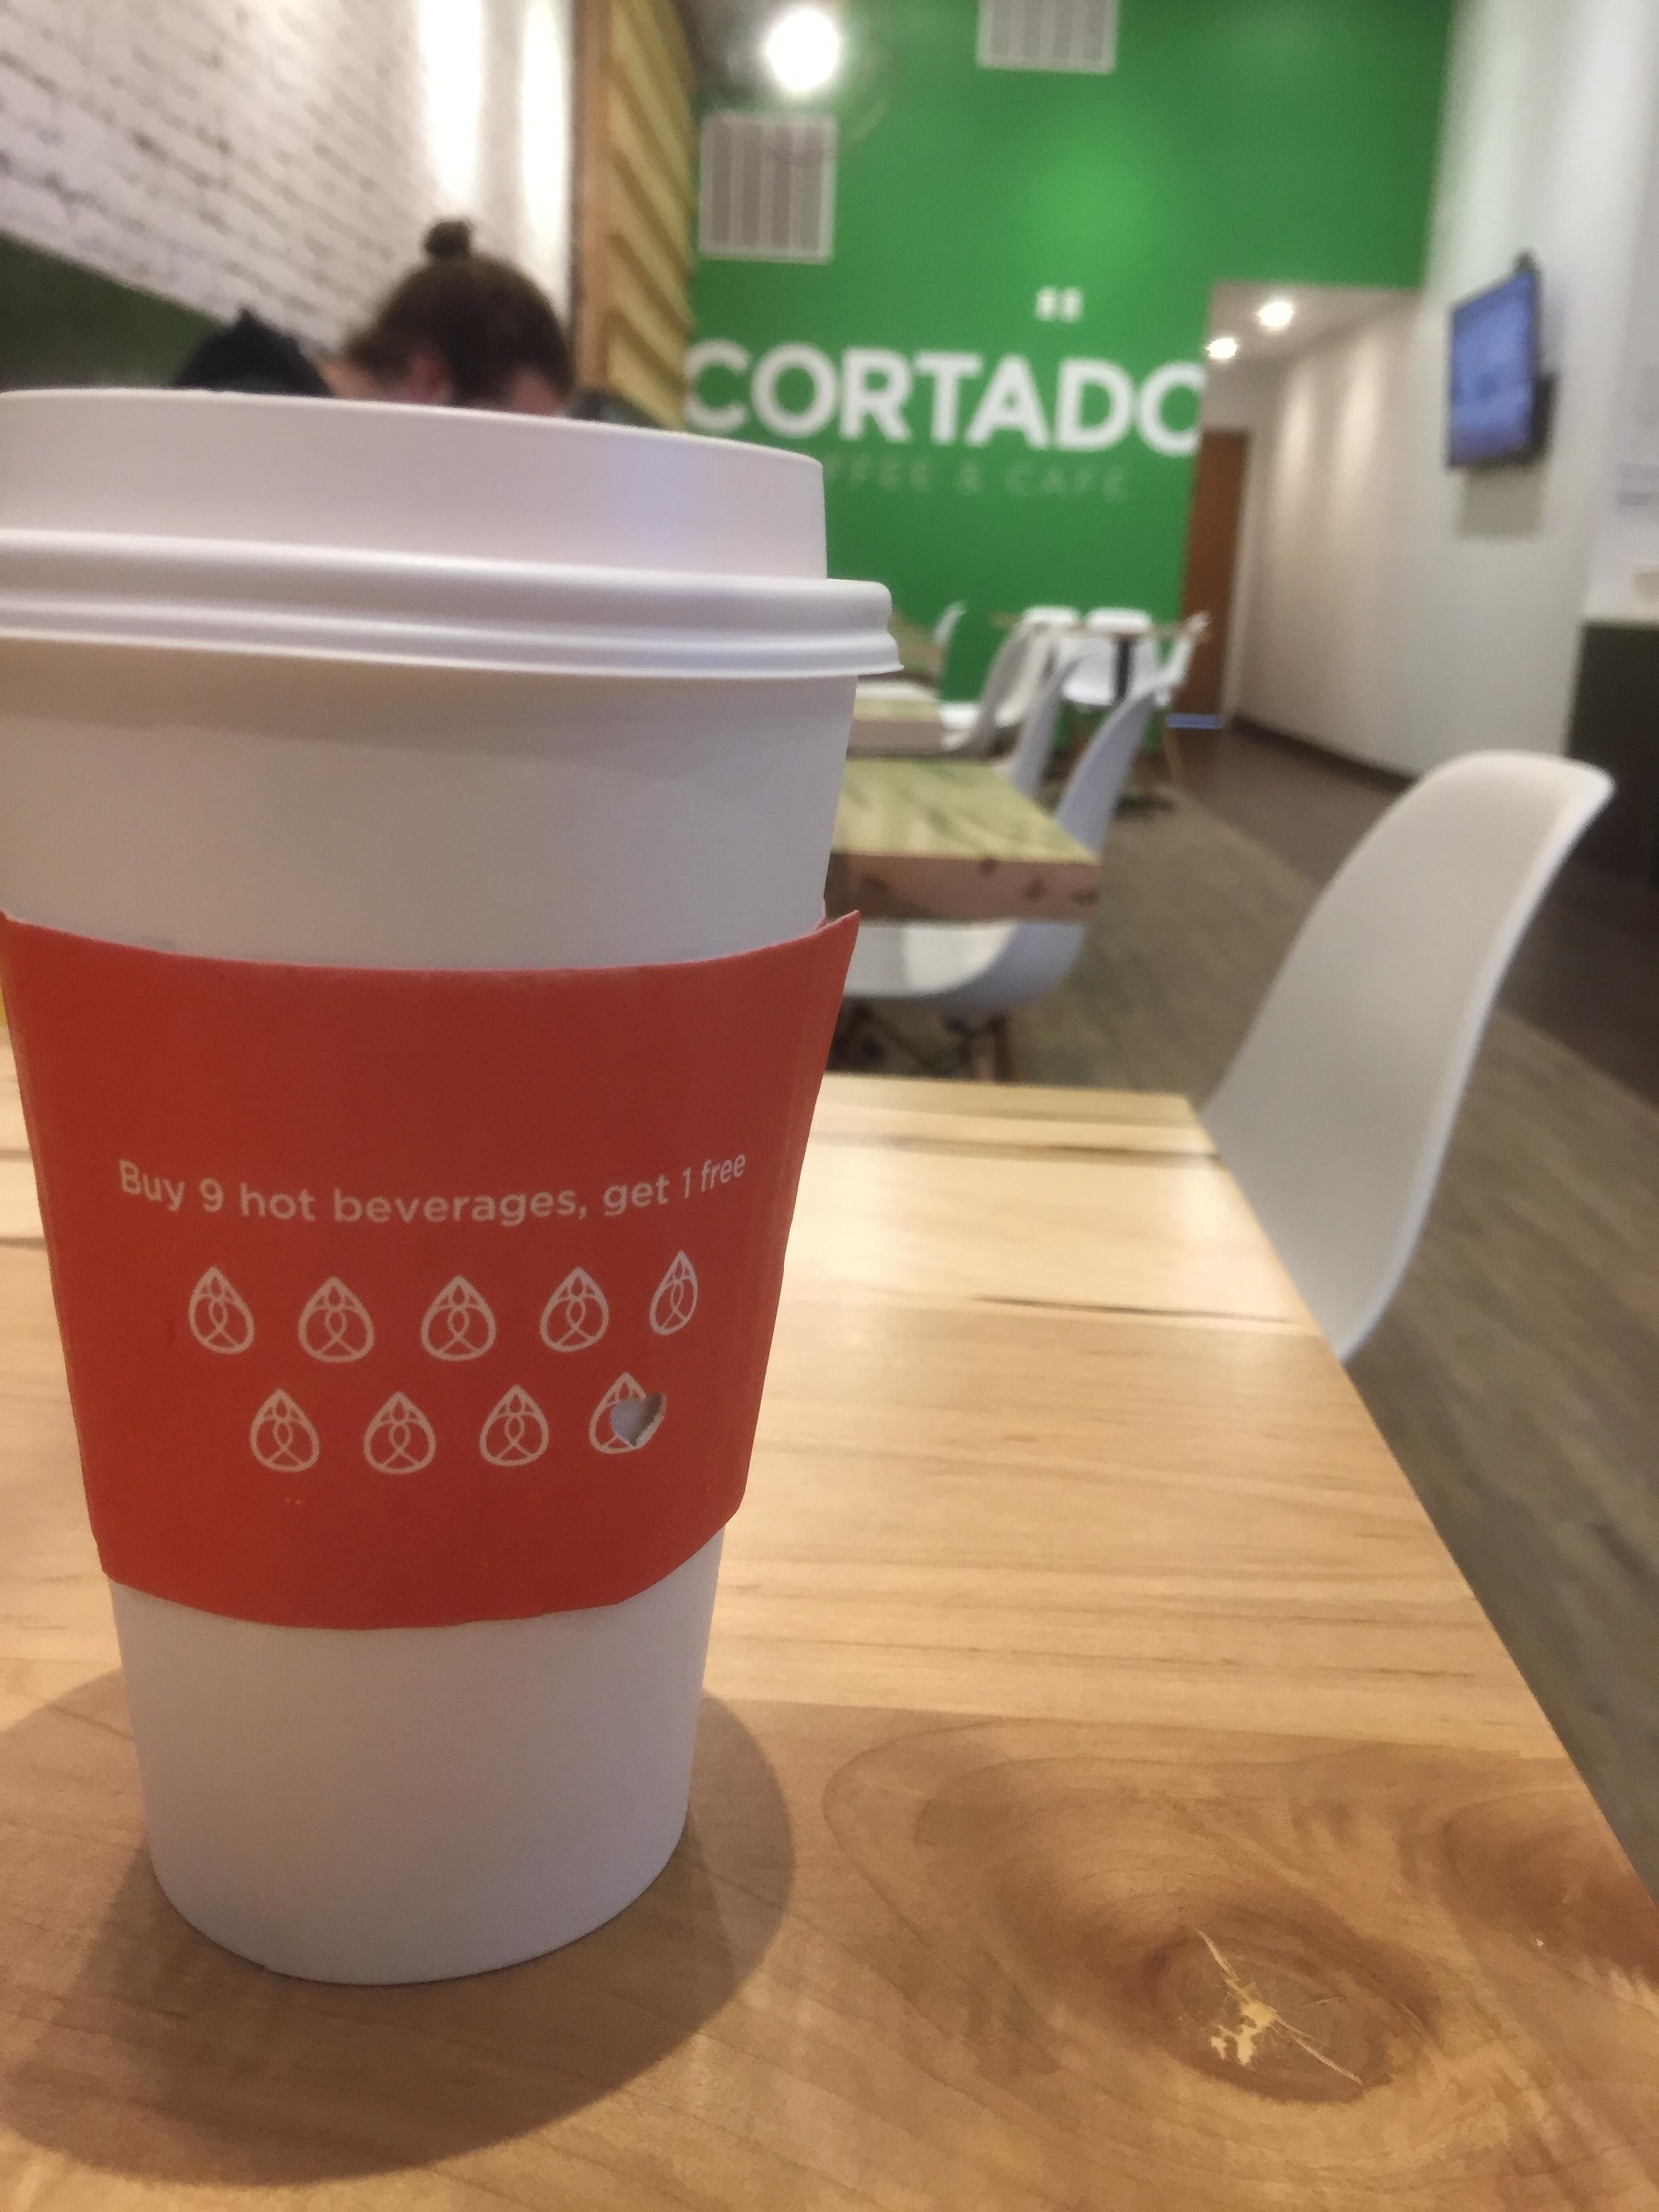 When you want coffee with a modern vibe... - Cortado Coffee & Cafe26 S Clinton St, Iowa City, IA(319) 519-2340